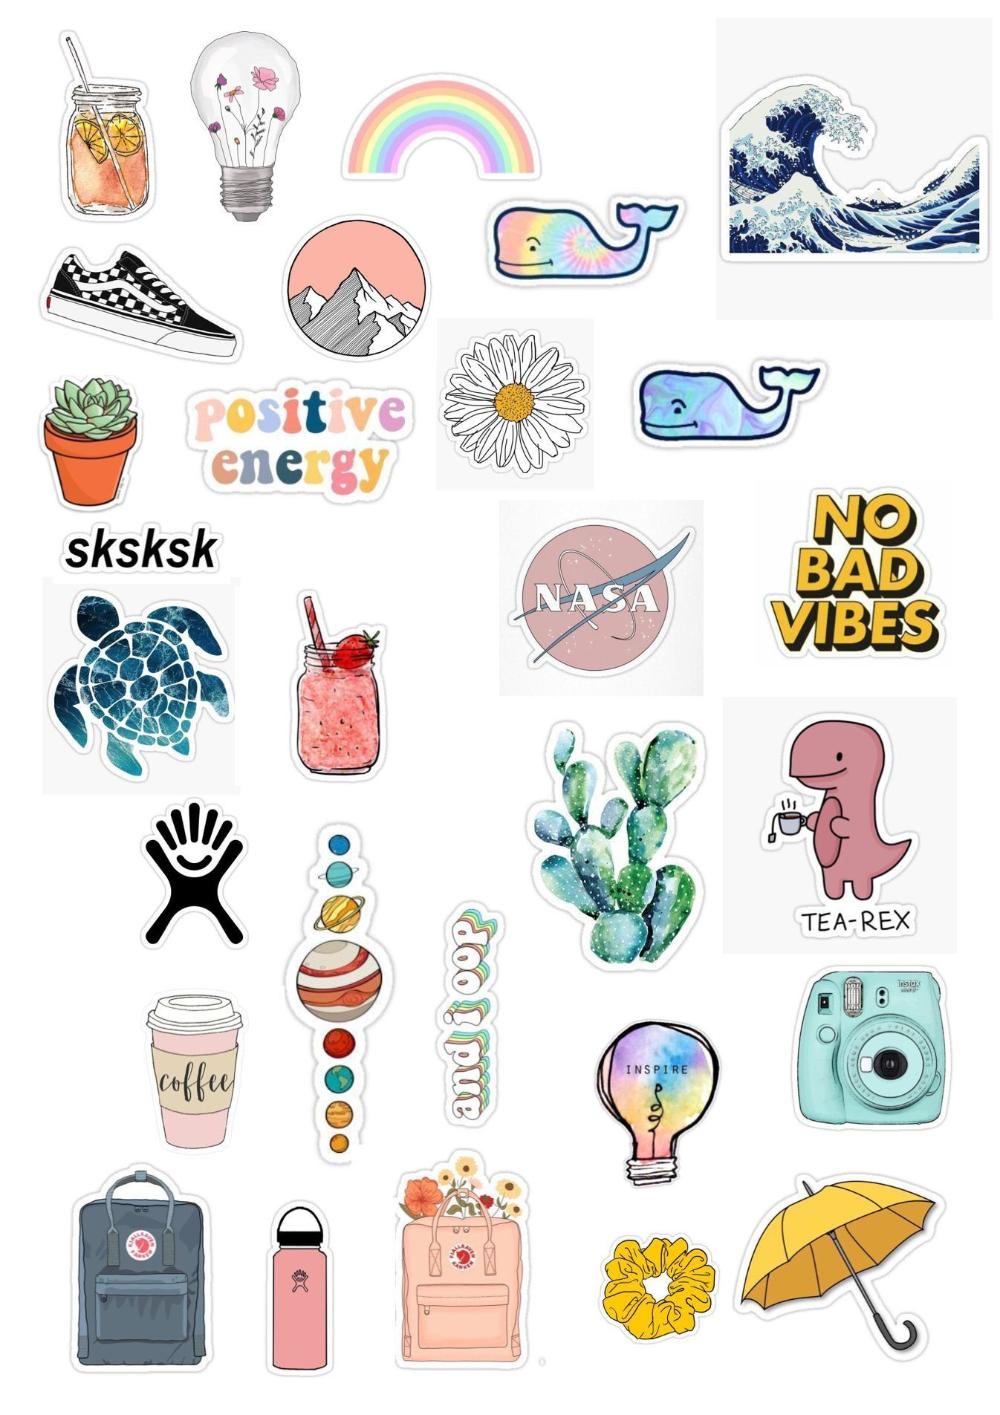 Imagens De Adesivos Para Imprimir Tumblr De Paises Pesquisa Google Adesivos Legais Adesivos Sticker Adesivos Bonitos